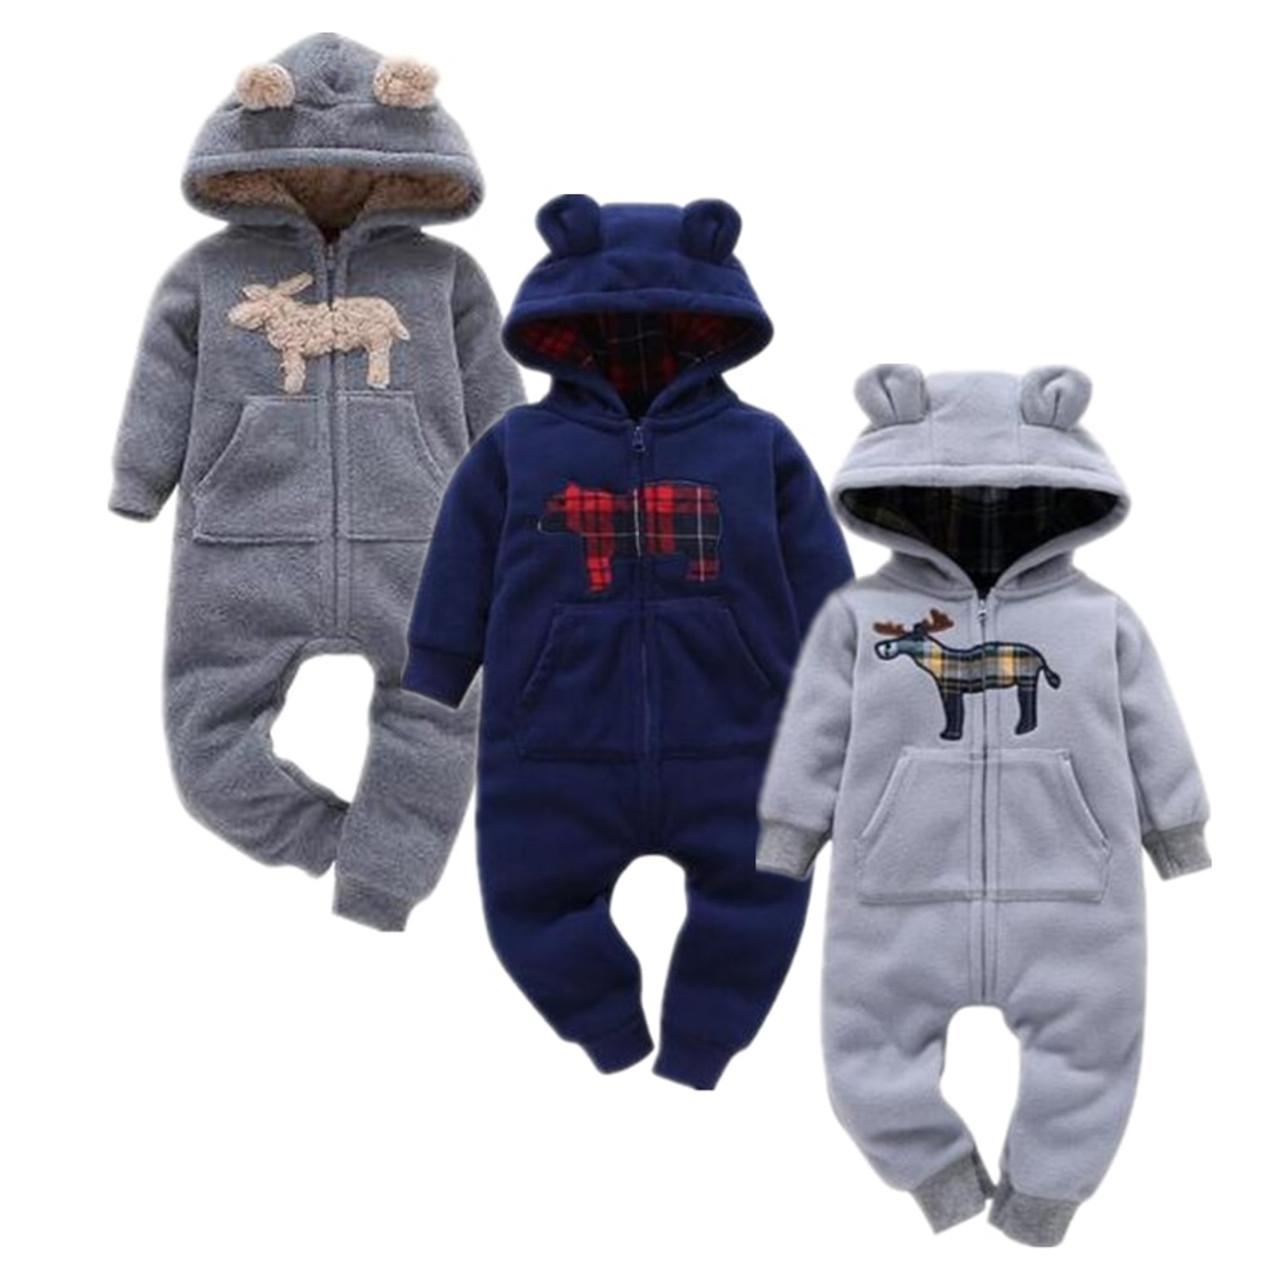 2e2c31e7b 2018 baby boys clothes girls Fleece rompers cartoon Hooded Jumpsuit ...